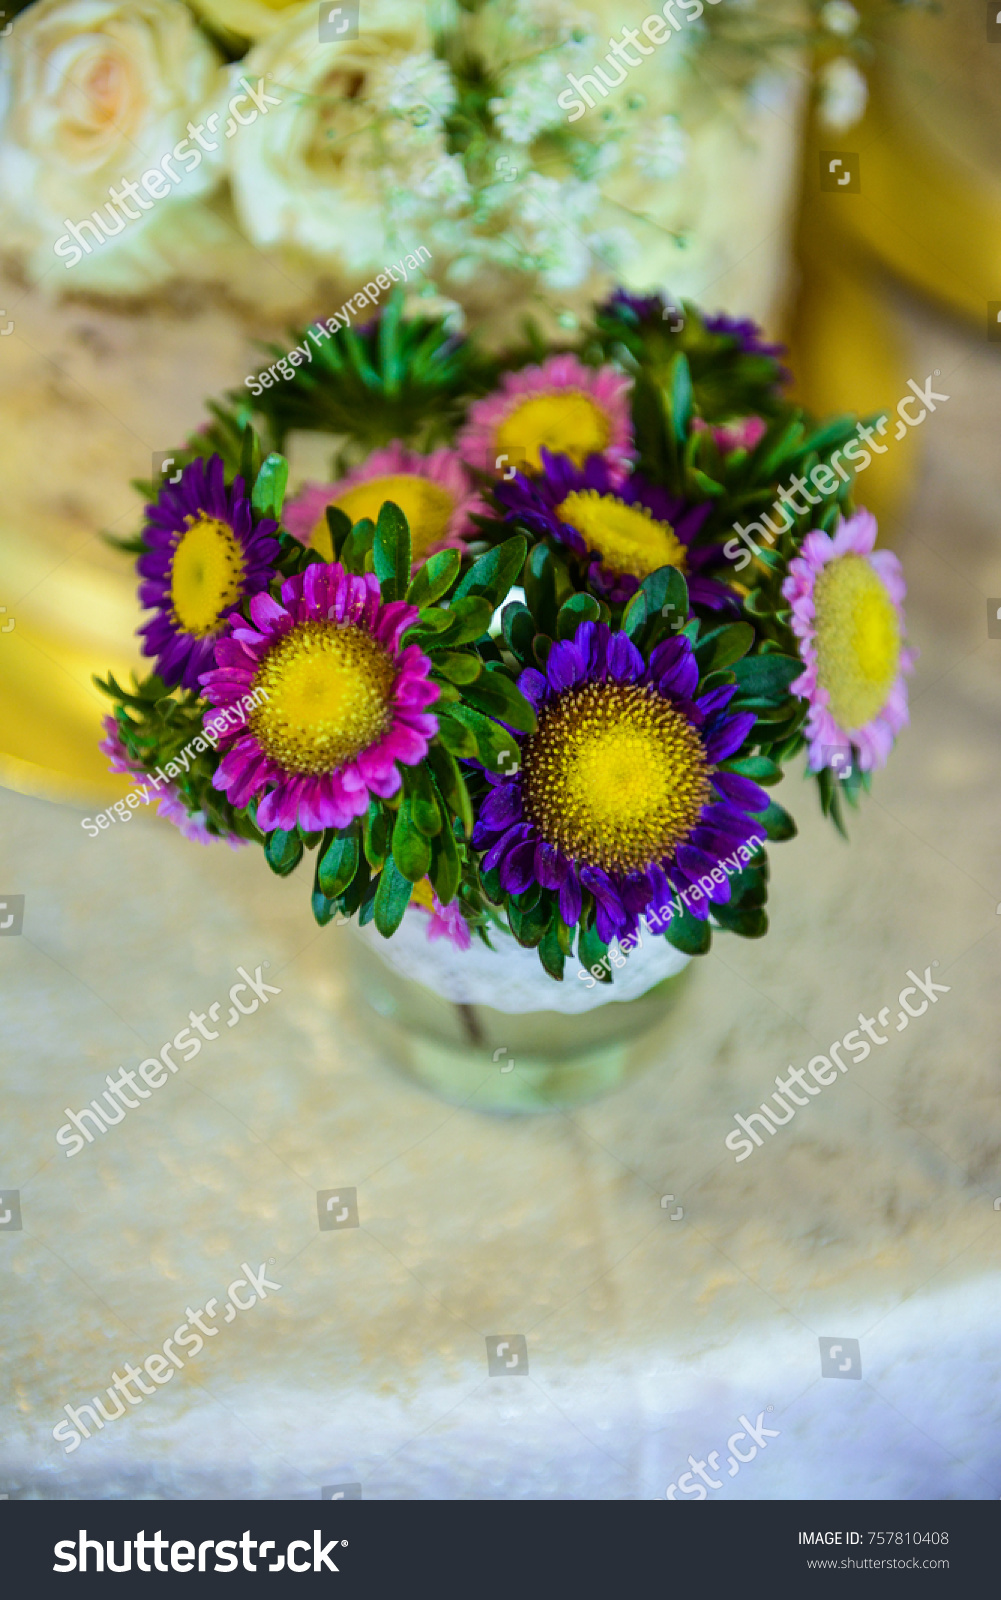 Florist making bouquet flowers bouquet wedding stock photo royalty florist making bouquet flowers for bouquet wedding bouquet of flowers bouquet of wildflowers izmirmasajfo